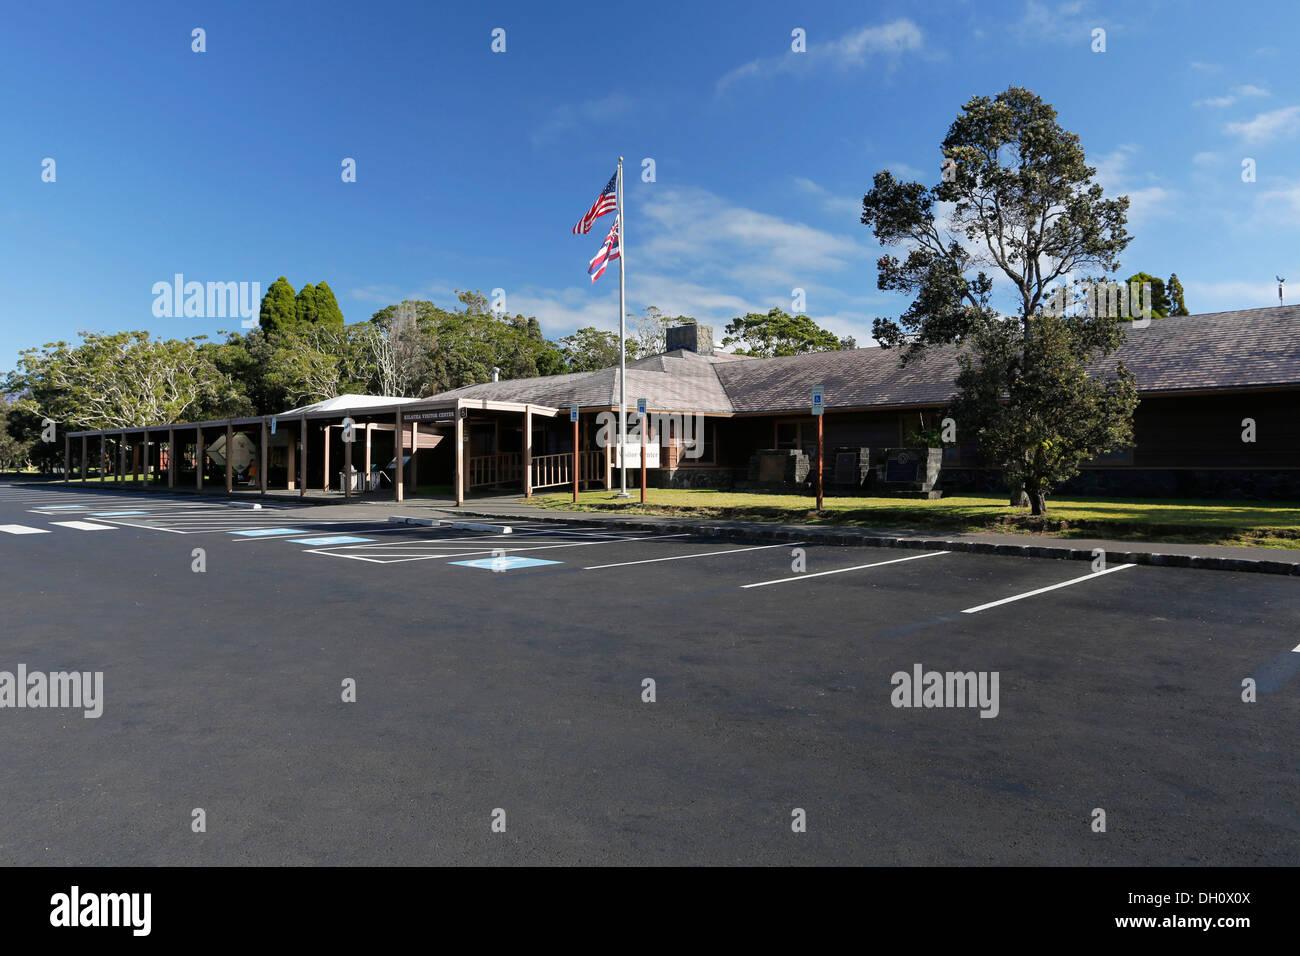 Kilauea Visitor Center, Hawaii Volcanoes National Park, Big Island, Hawaii, USA - Stock Image